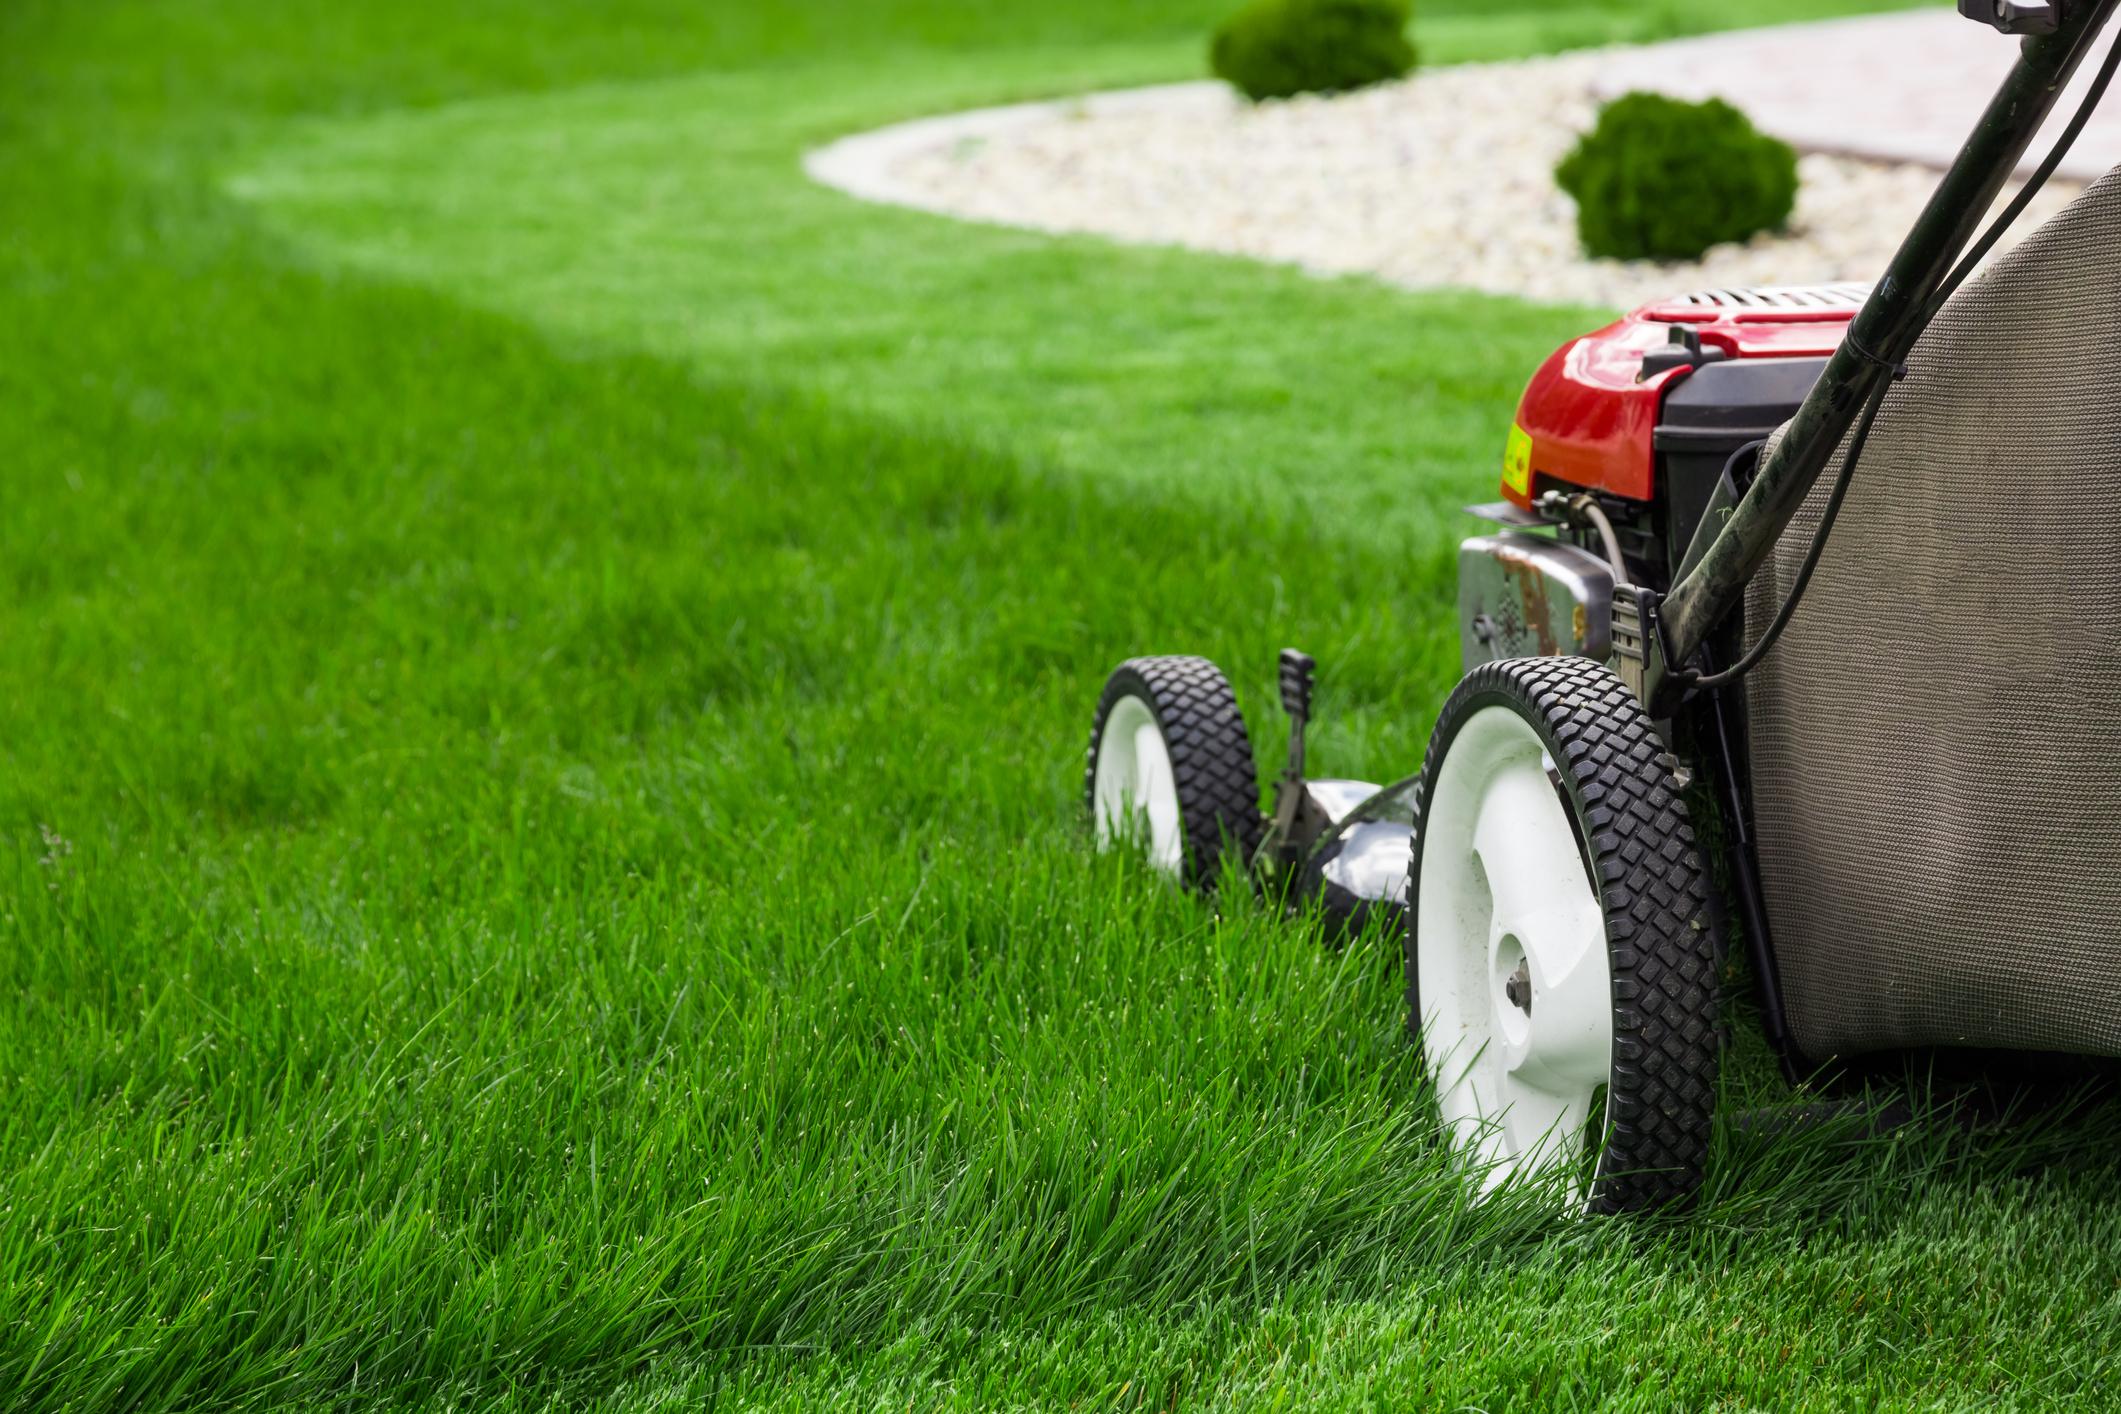 A lawnmower cuts a line through the grass